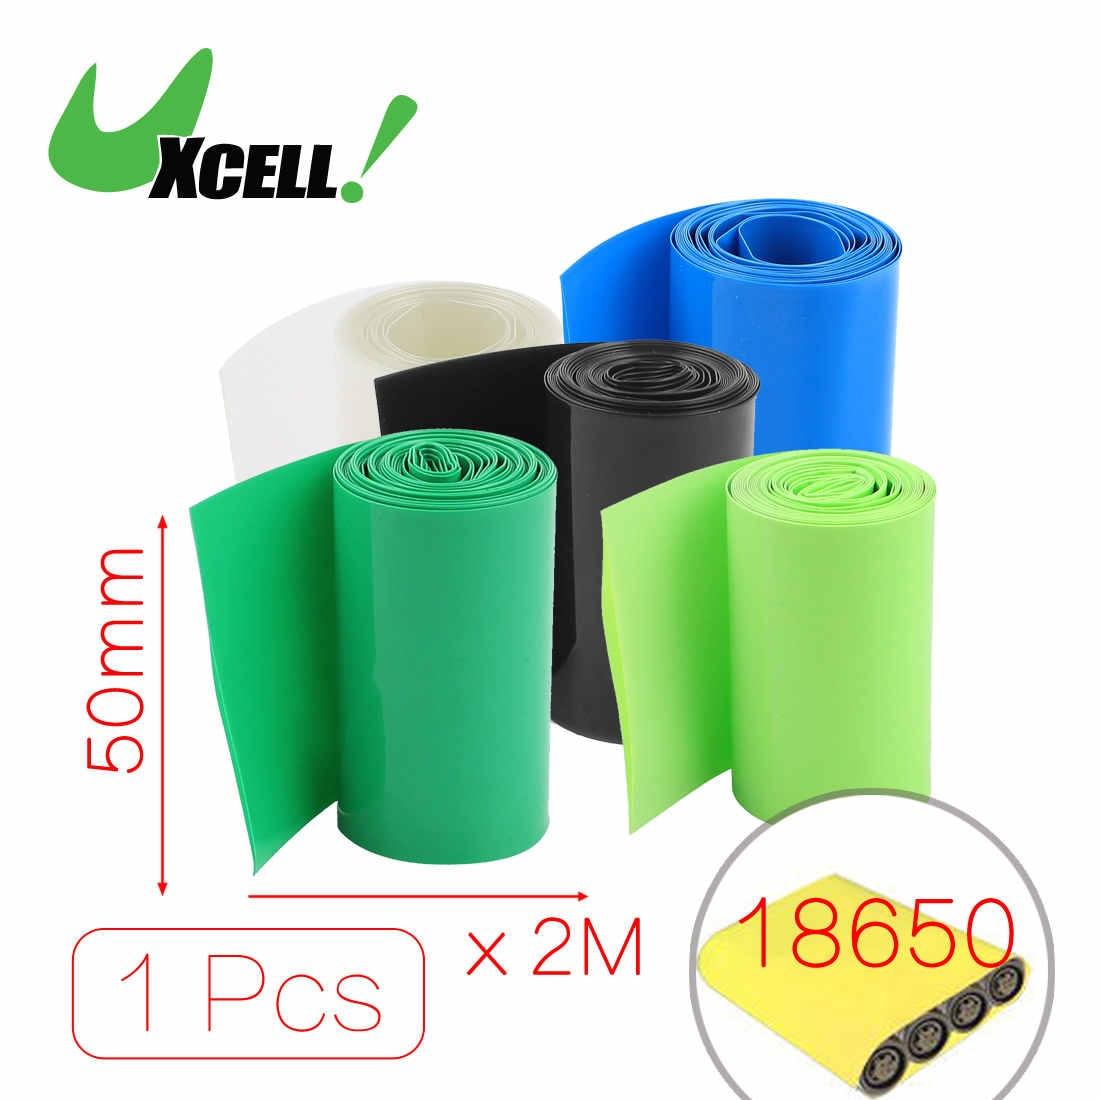 Uxcell 2Meters 50Mm Width Pvc Heat Shrink Wrap Tube Blue For 2 X 18650 Battery .blackbluecleargreengrren